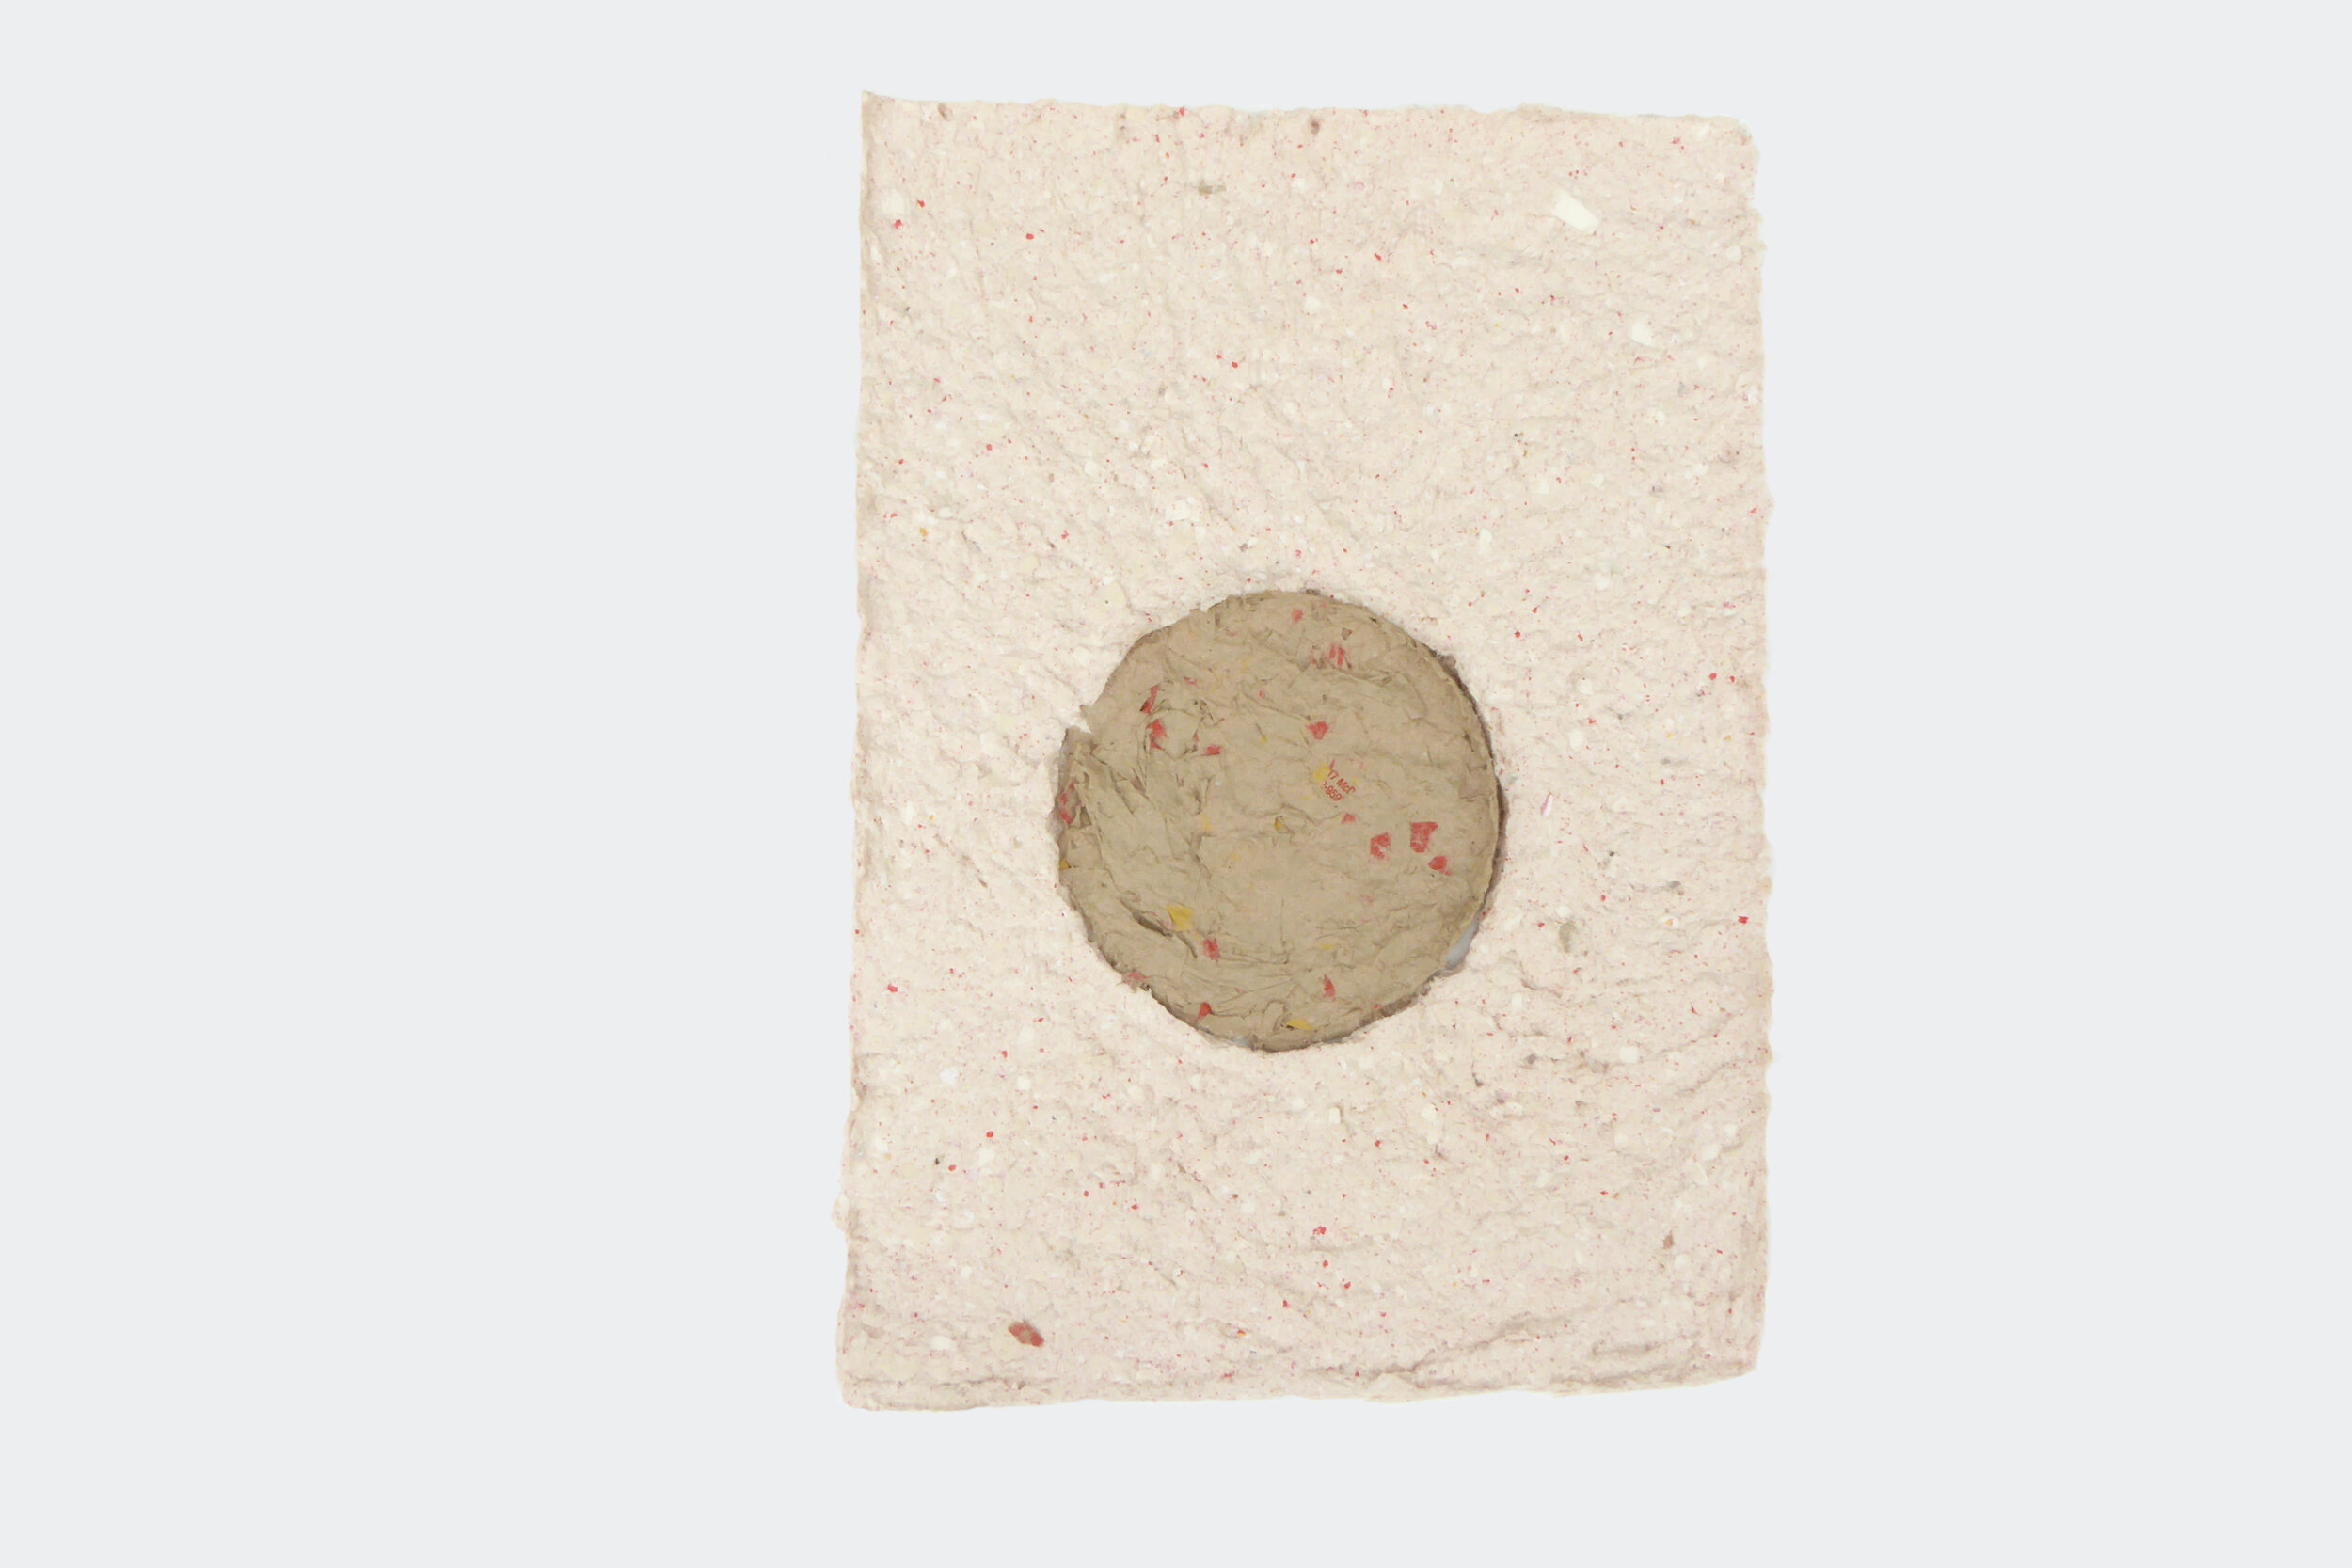 Paul Handley  / Southern Hemisphere #2, 2019 / McDonald's fries packaging and brown bag / 21 cm x 30 cm